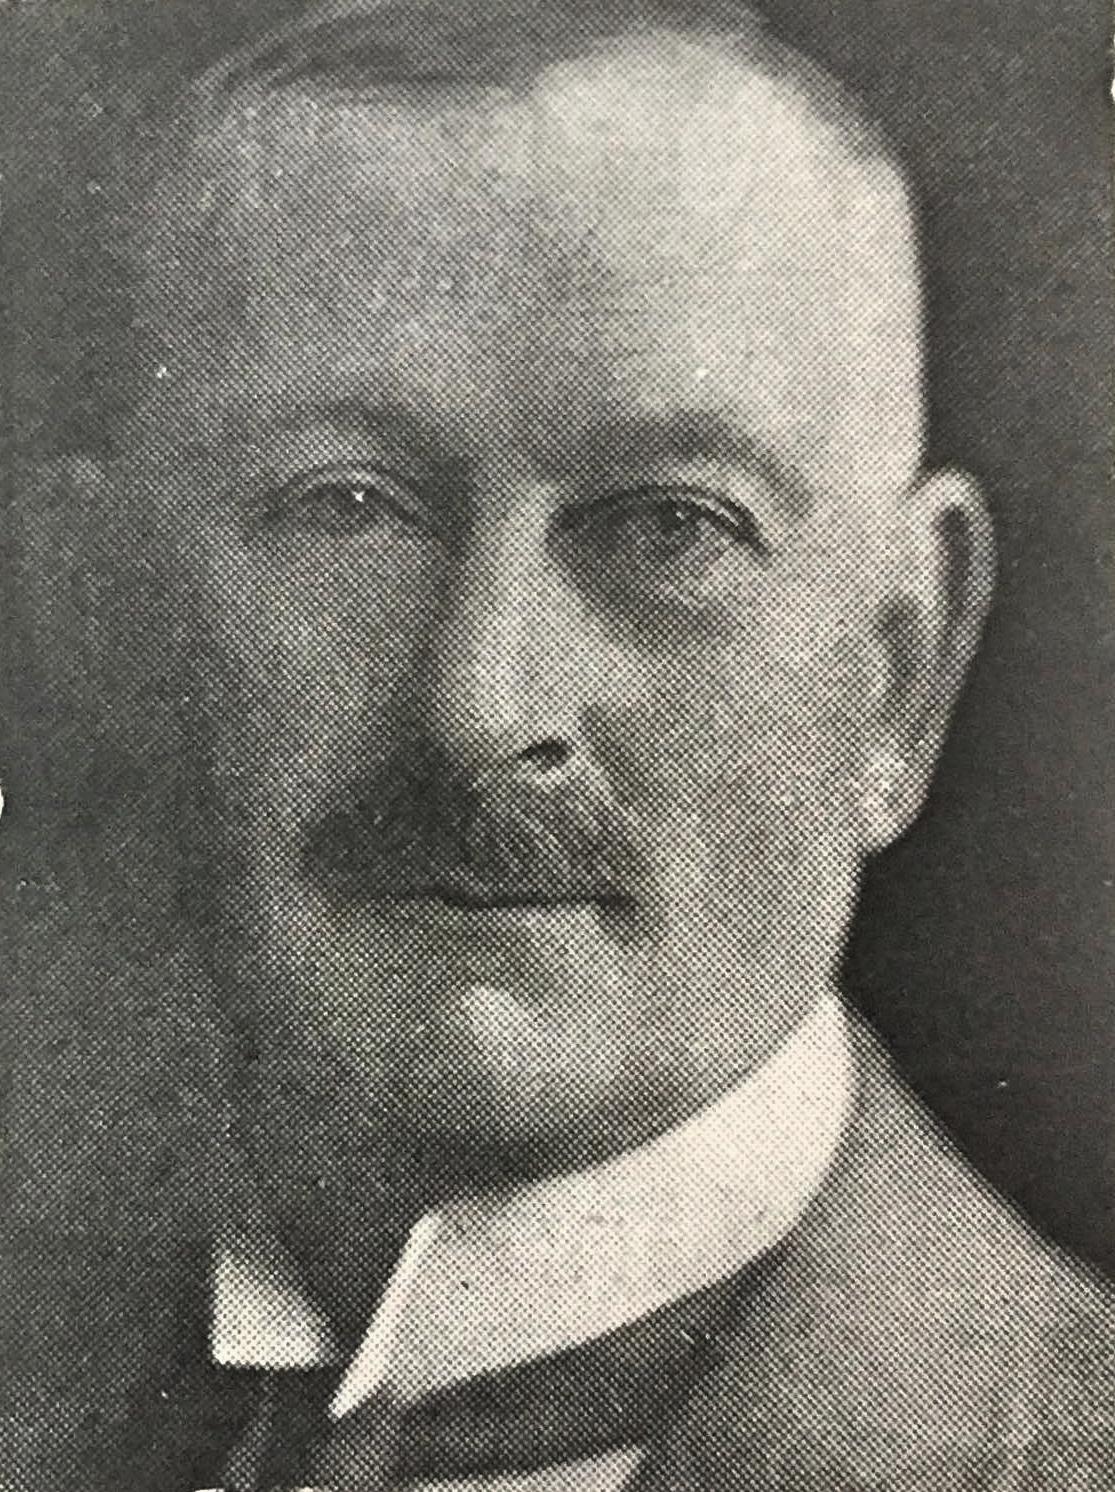 Young John Gleed was Albatross fodder in 1917